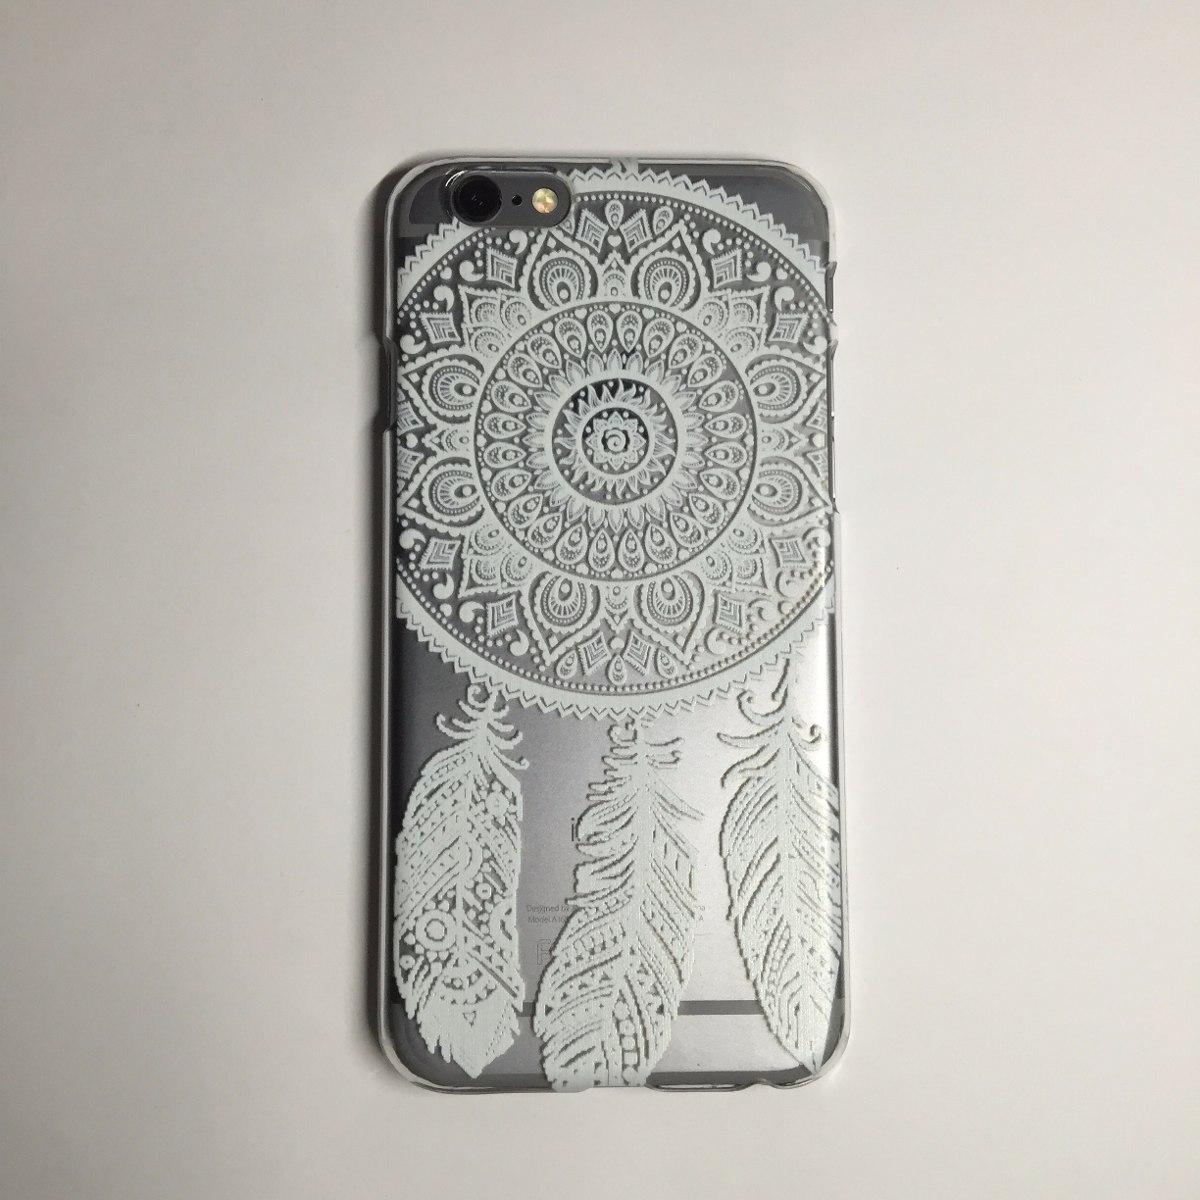 donde comprar iphone 6s plus mas barato